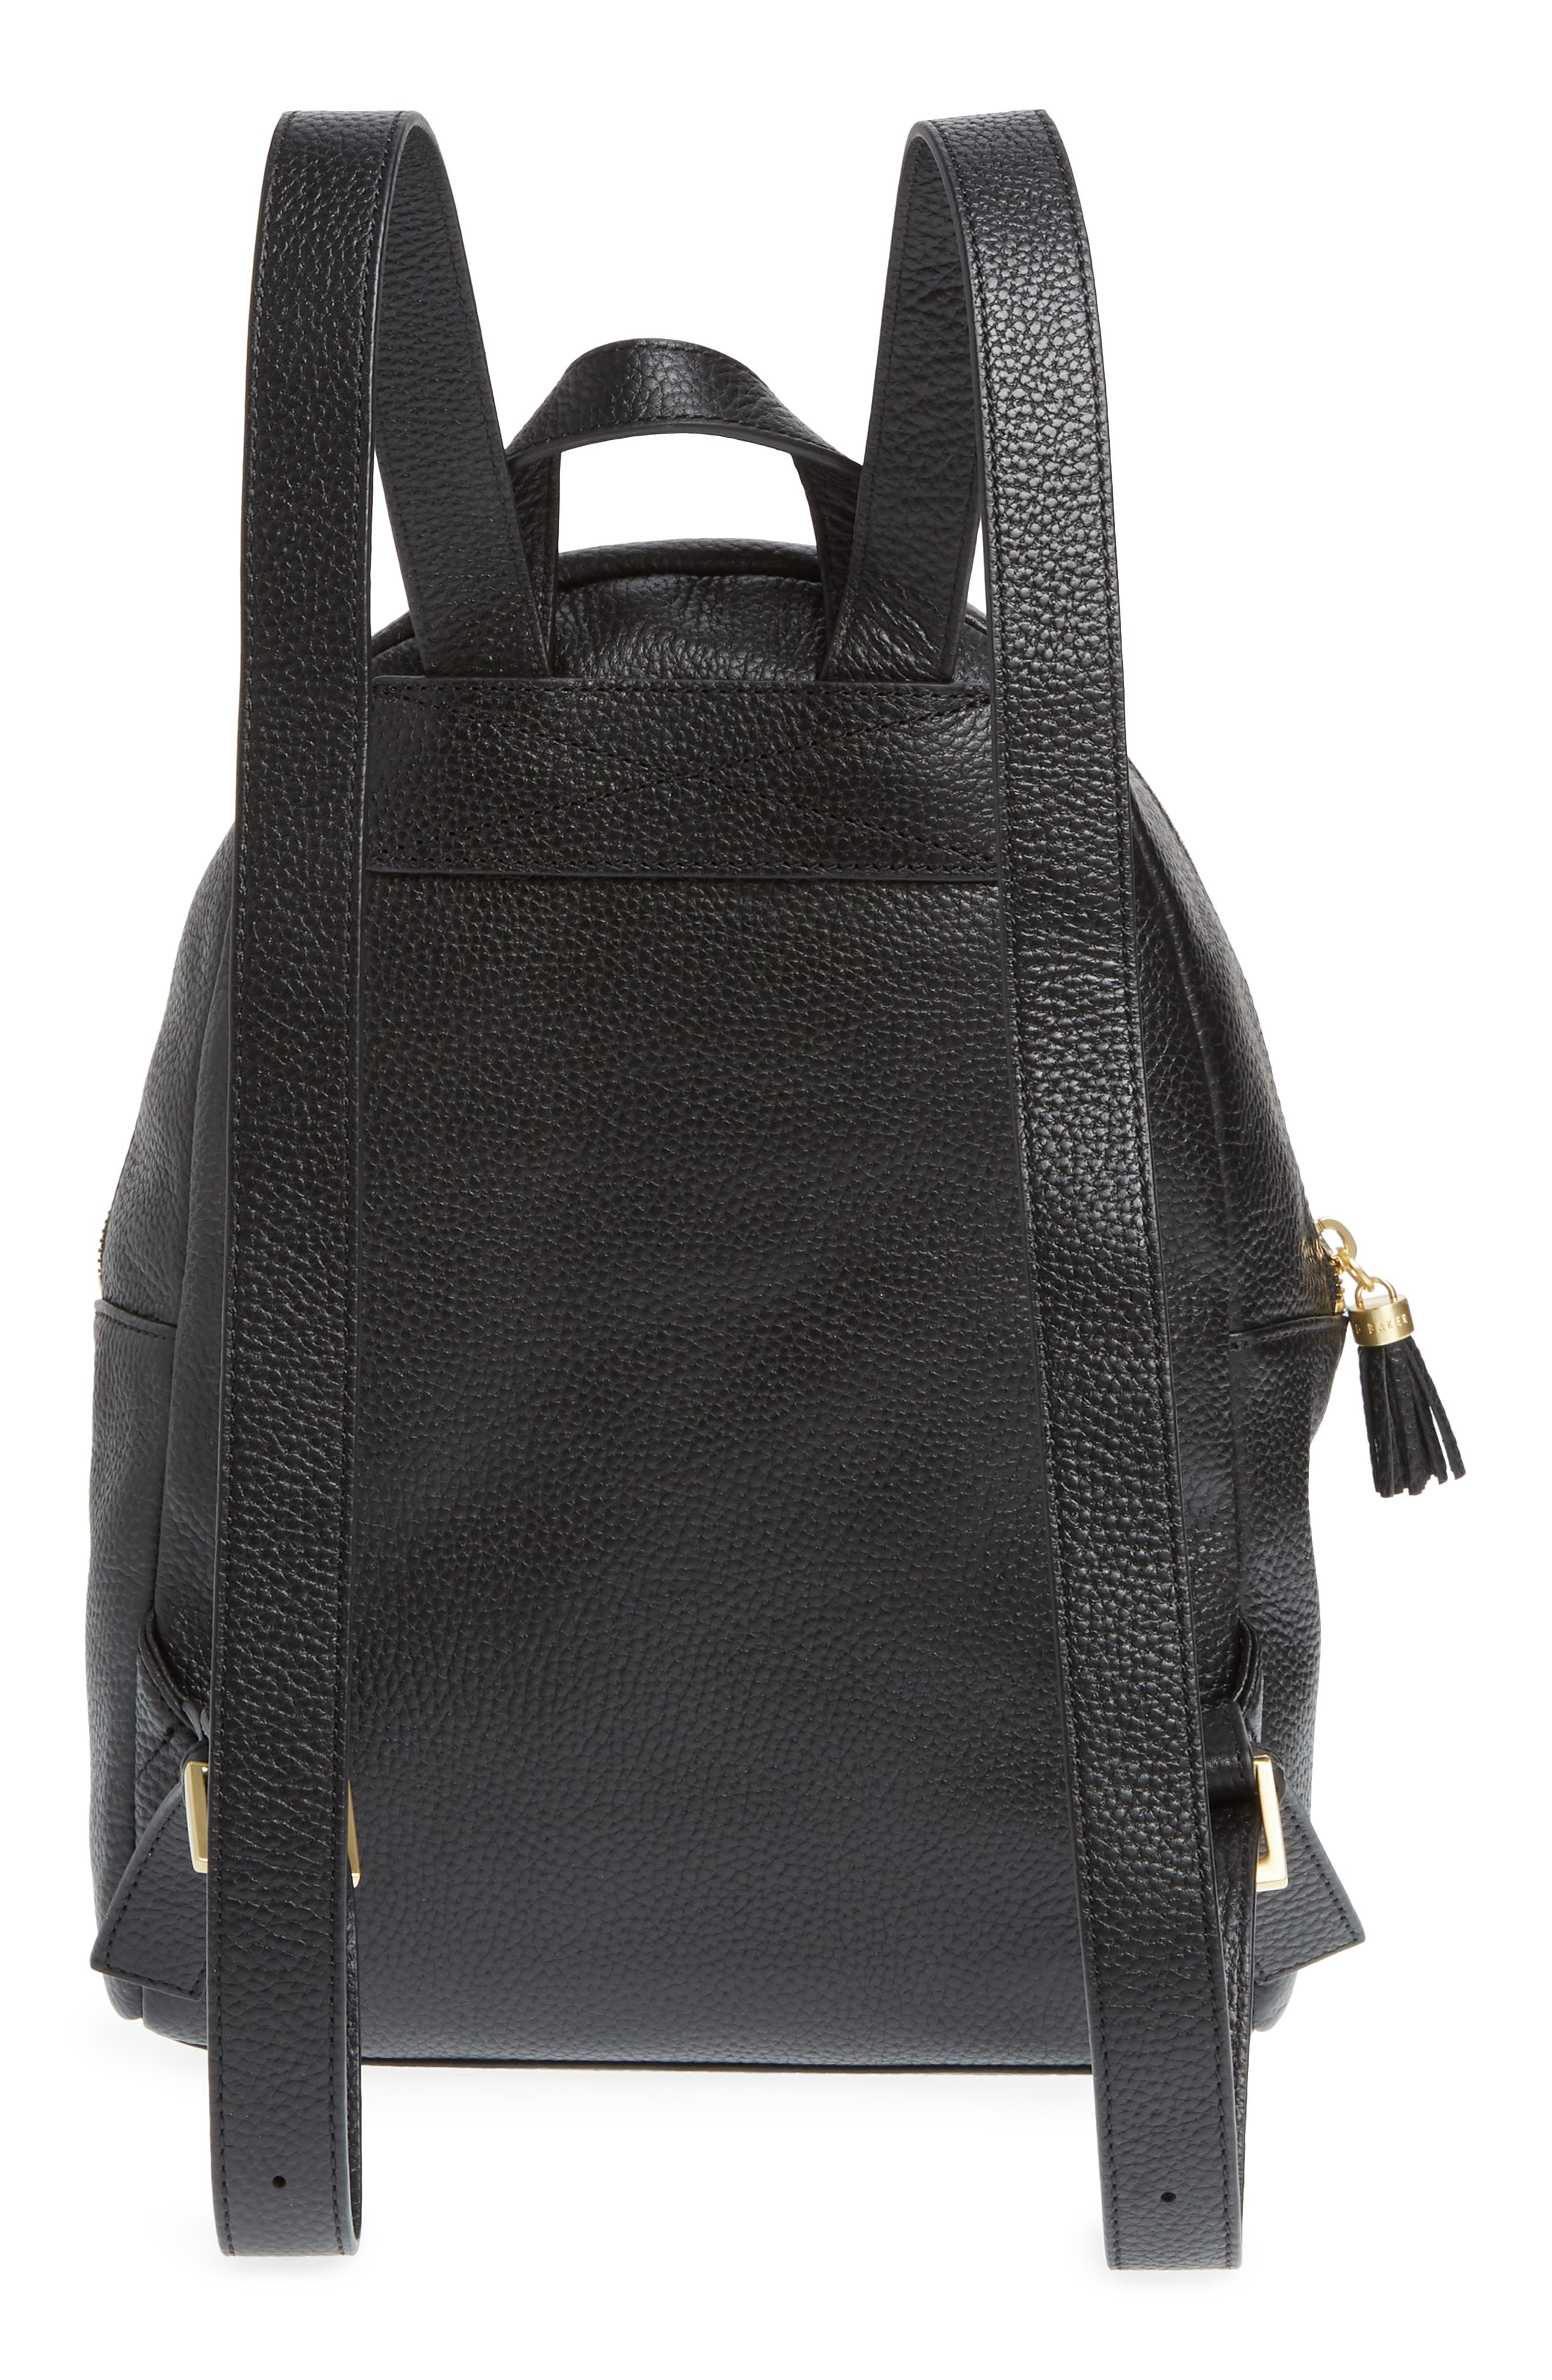 TED BAKER LONDON,                             Leather Backpack,                             Alternate thumbnail 3, color,                             001